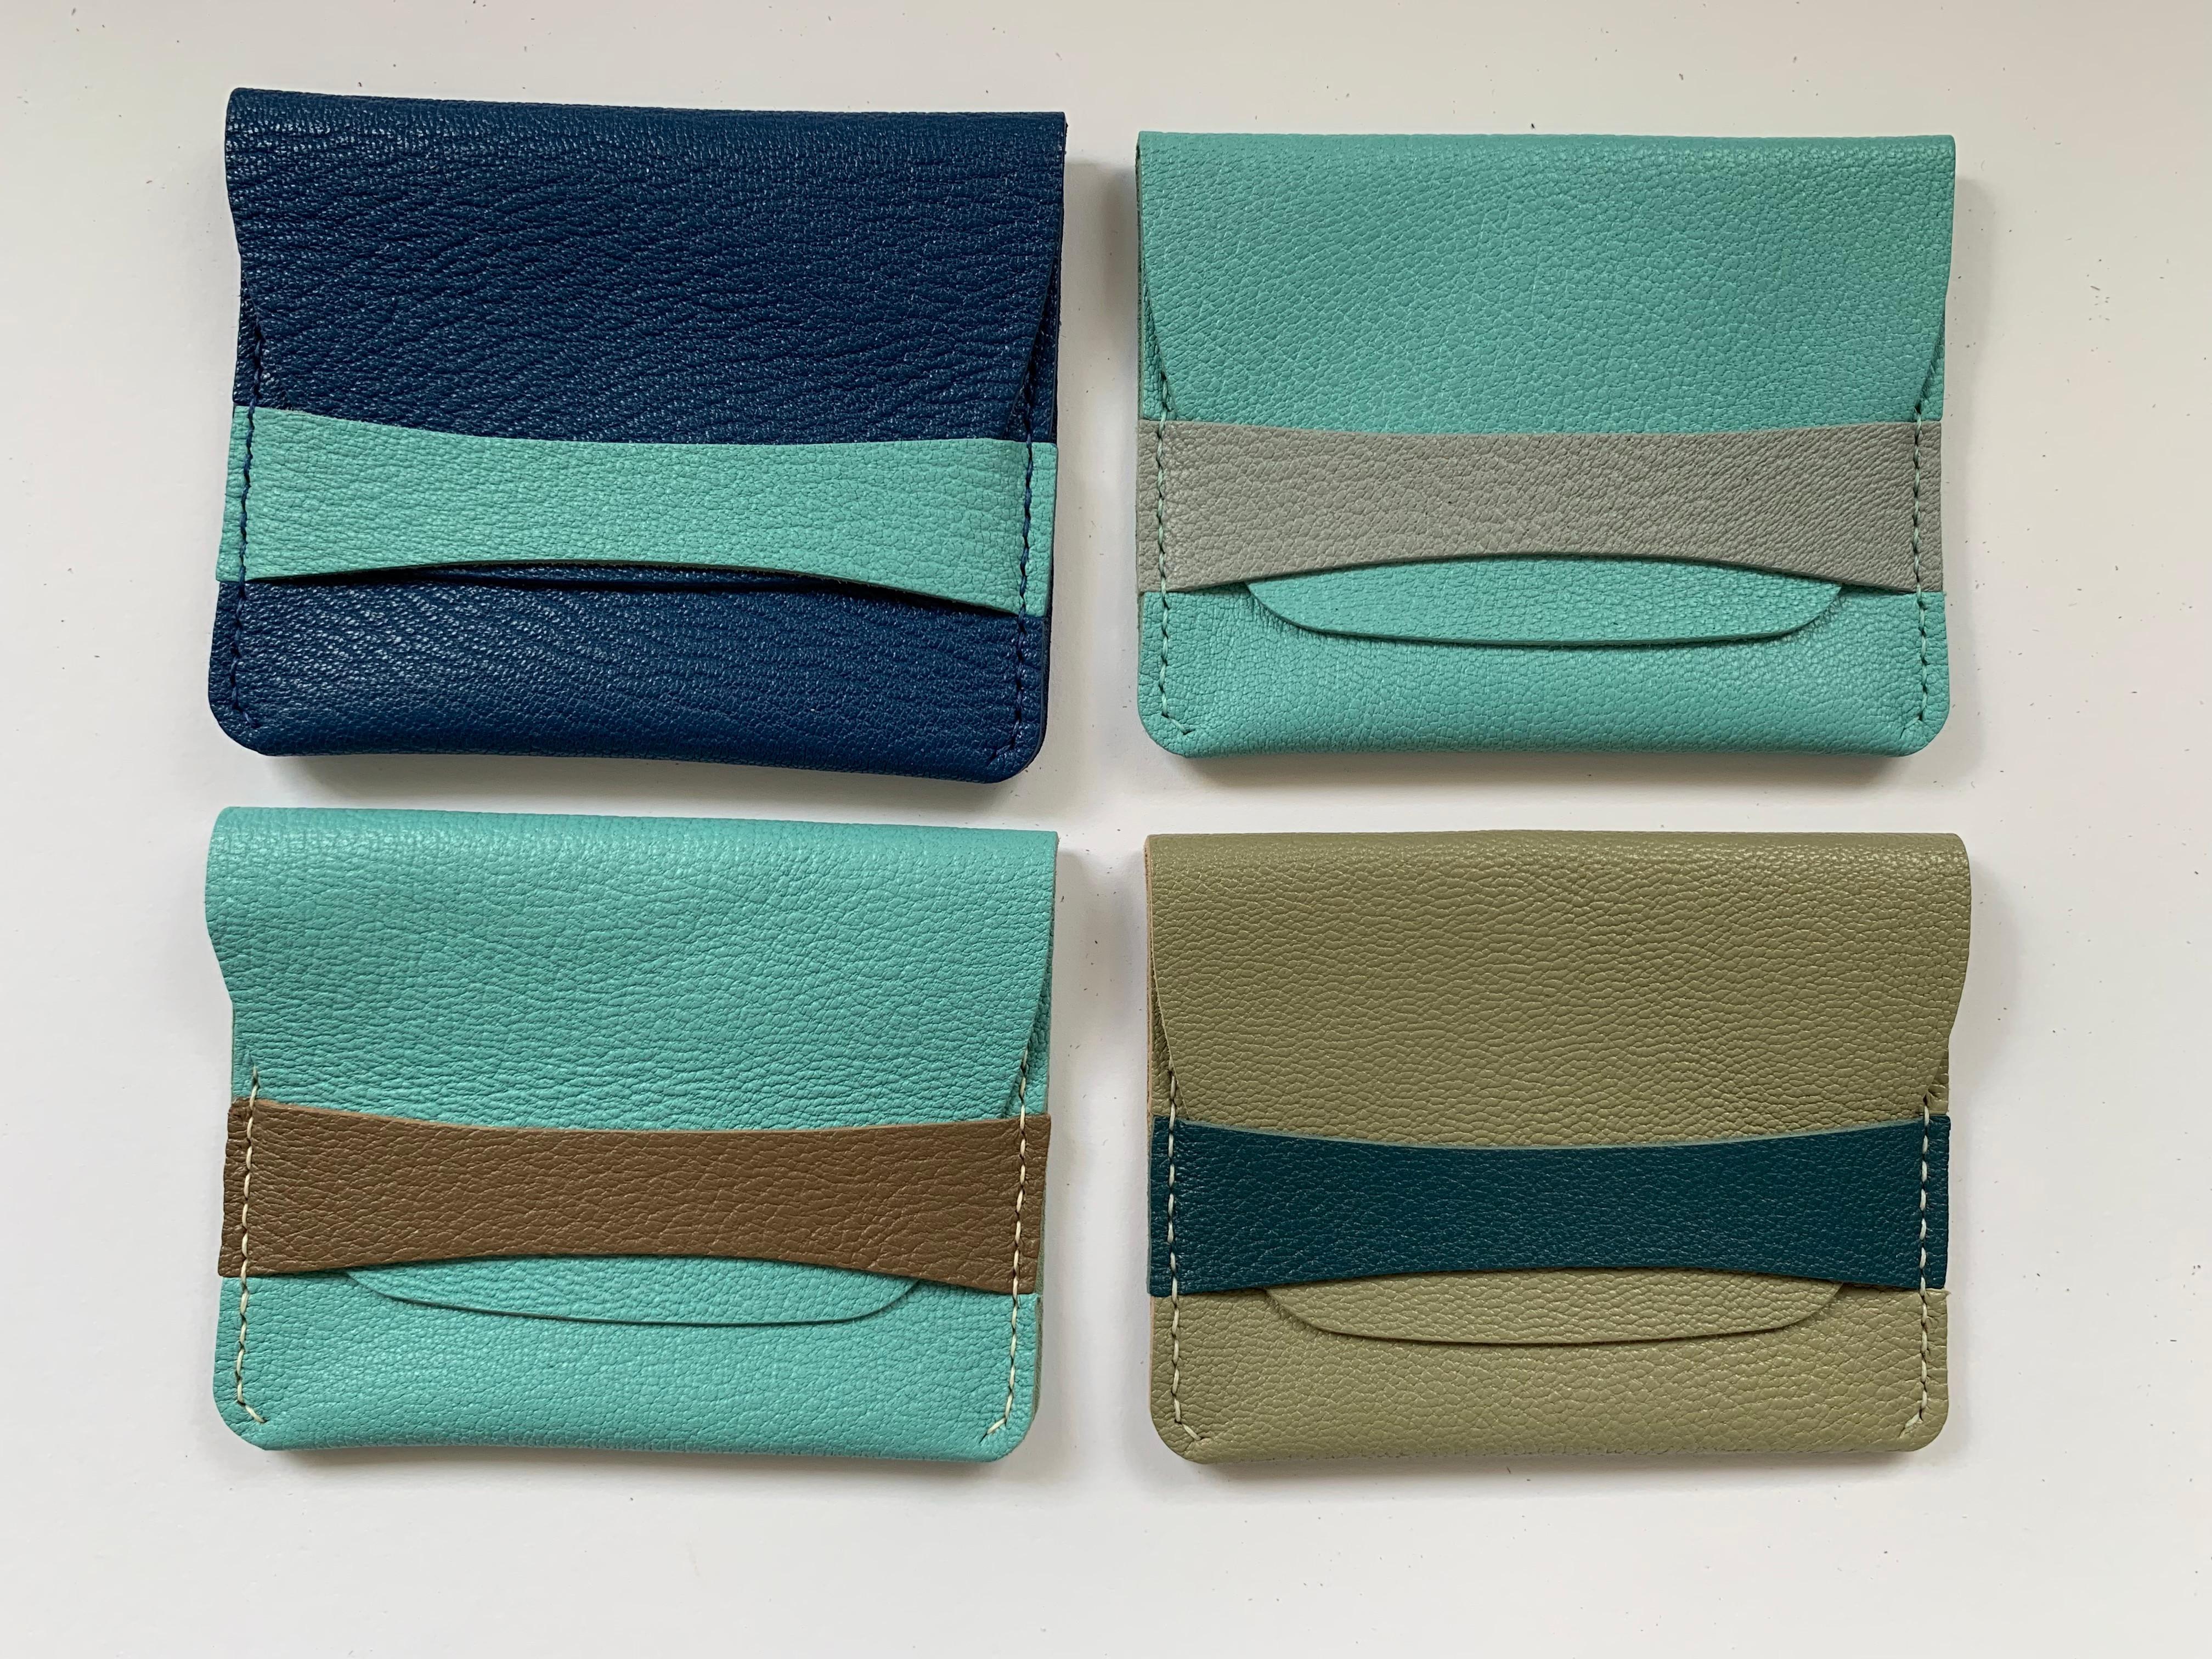 Premium Leather Pouch workshop